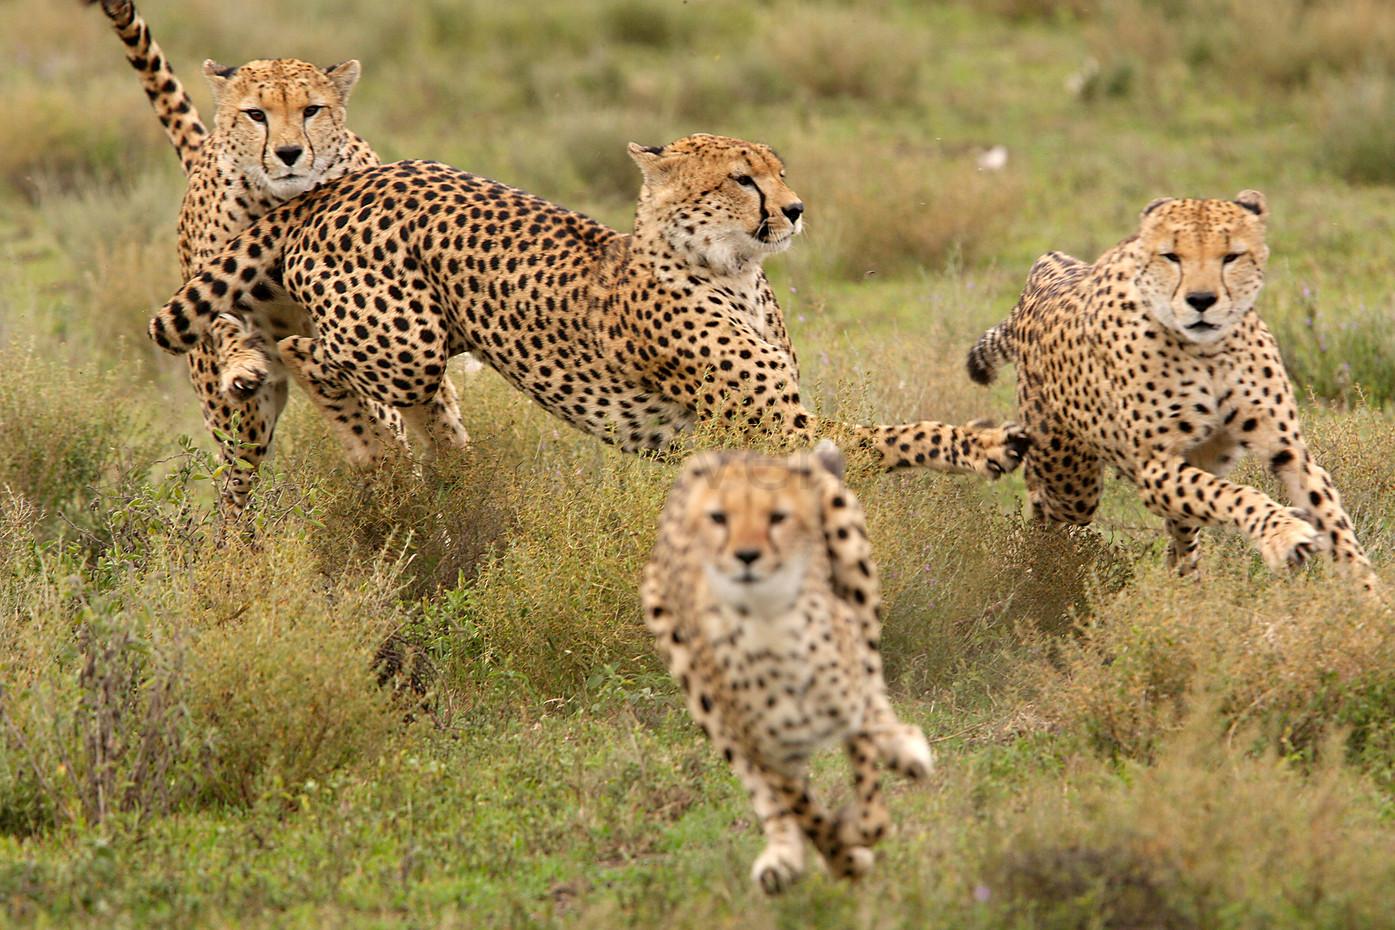 Cheetah in the Ngorongoro Conservation Area, Tanzania